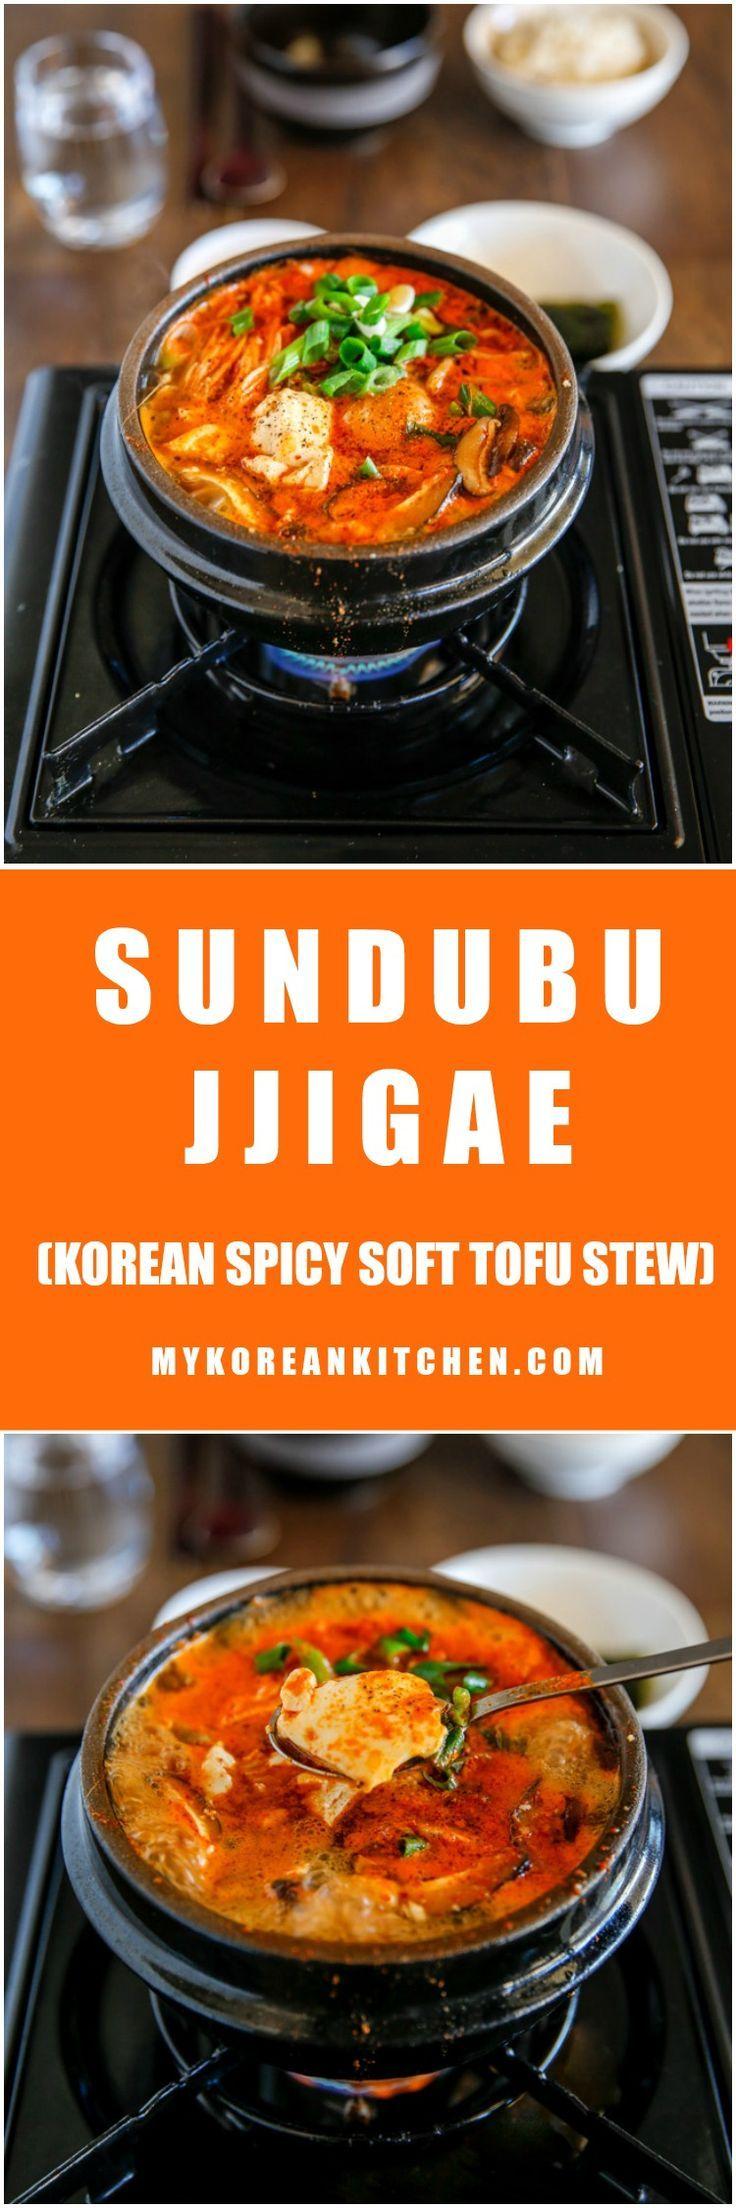 835 best korean recipes images on pinterest cooking food korean sundubu jjigae korean spicy soft tofu stew korean kitchenkorean cuisinekorean food recipesspicy tofu recipesvegetarian forumfinder Images